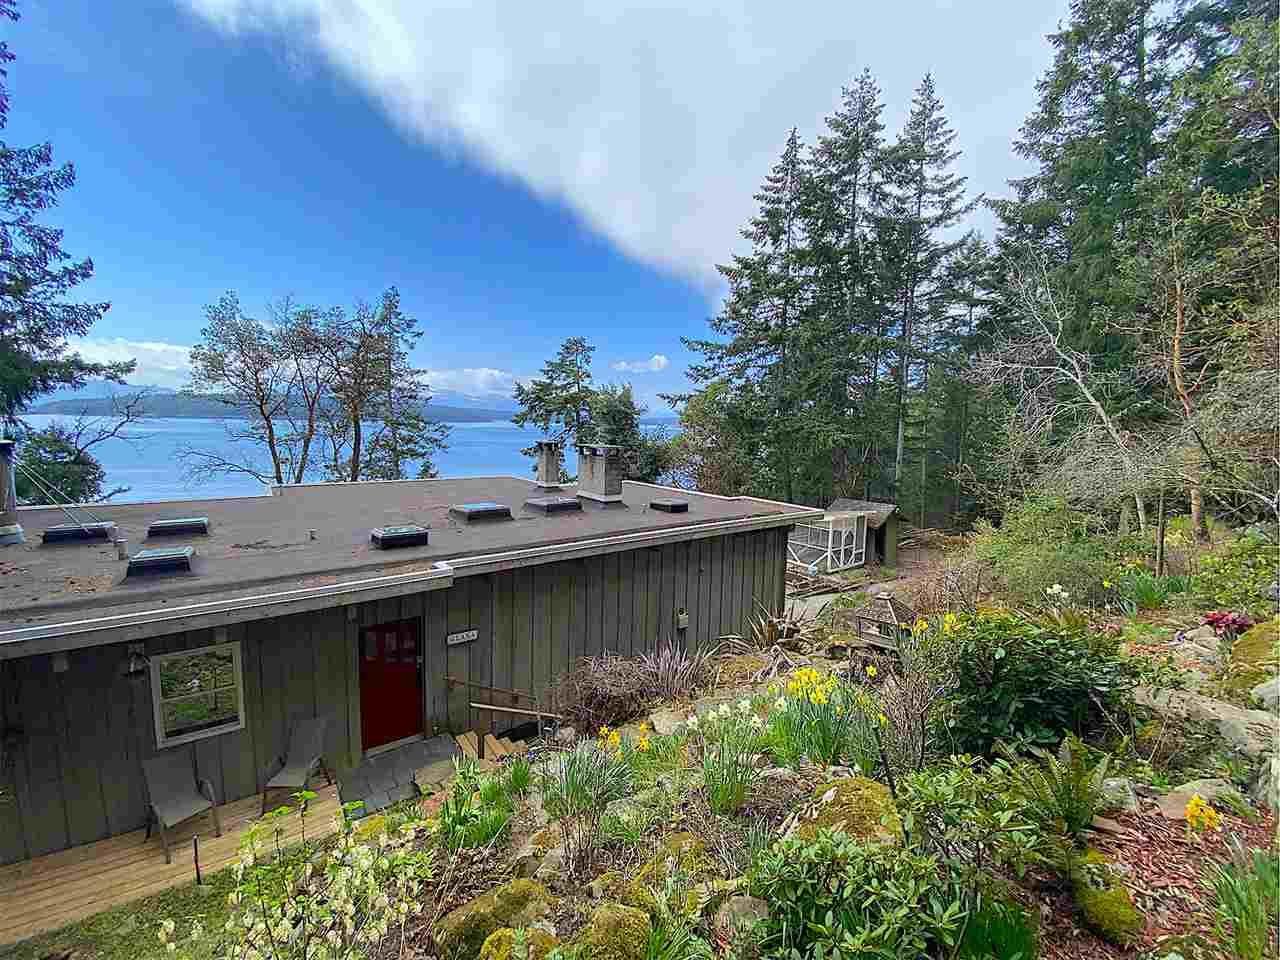 Main Photo: 355 TRINCOMALI Drive: Galiano Island House for sale (Islands-Van. & Gulf)  : MLS®# R2559208